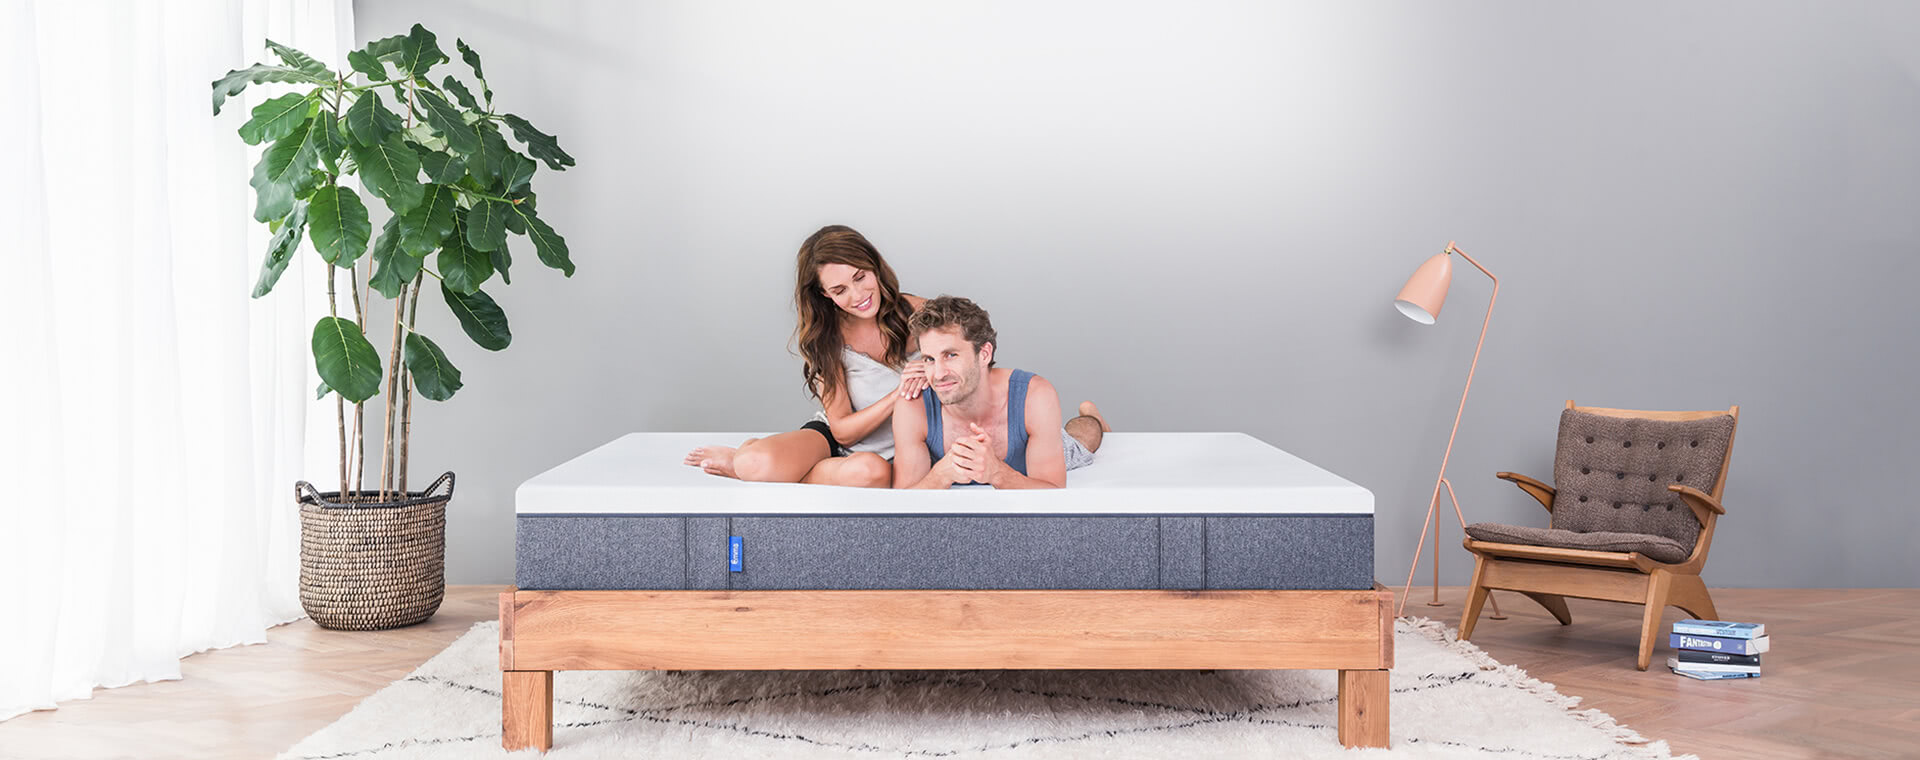 matelas mousse matelas conseils. Black Bedroom Furniture Sets. Home Design Ideas